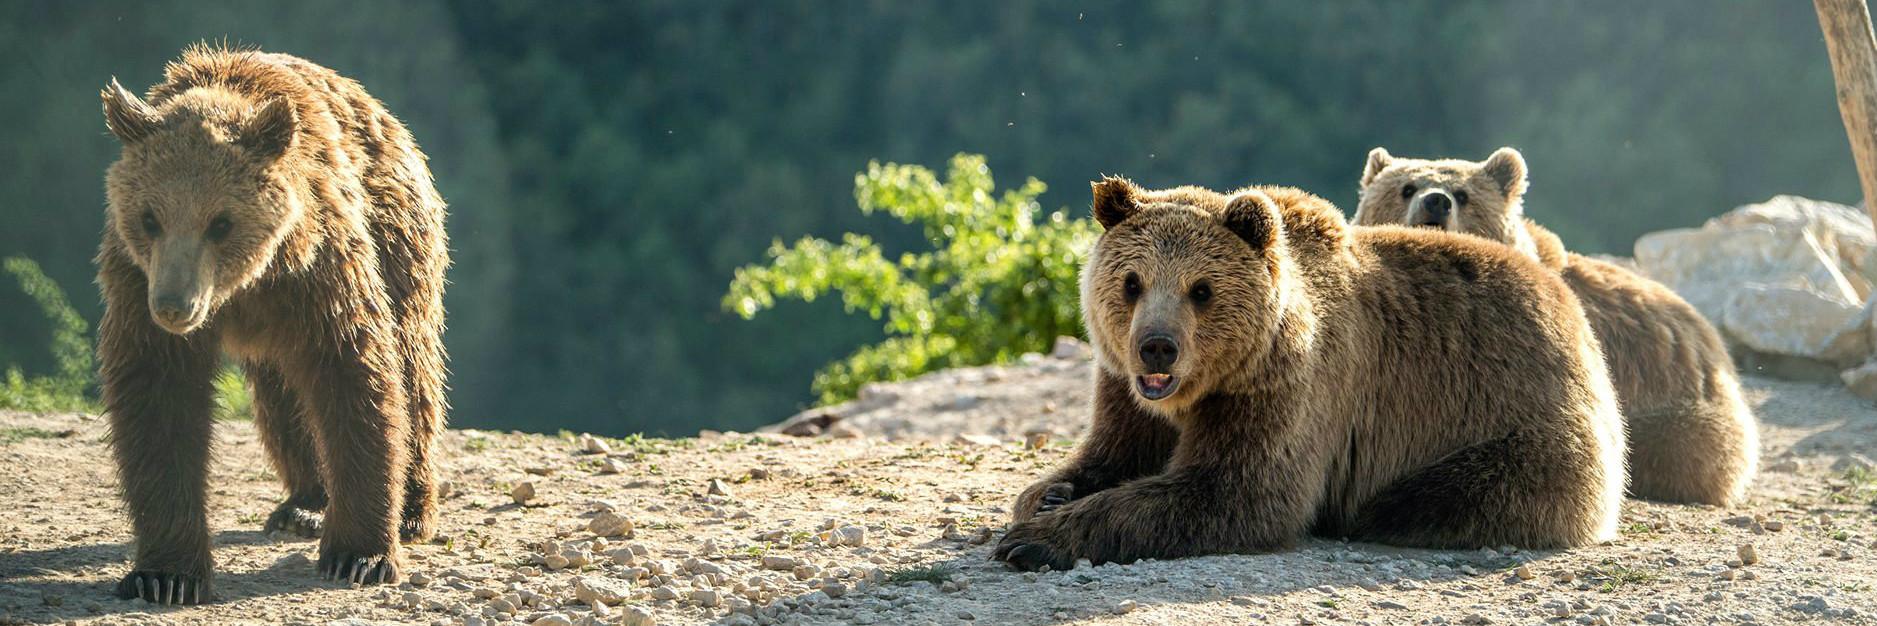 Bears Ema, Ron and Oska